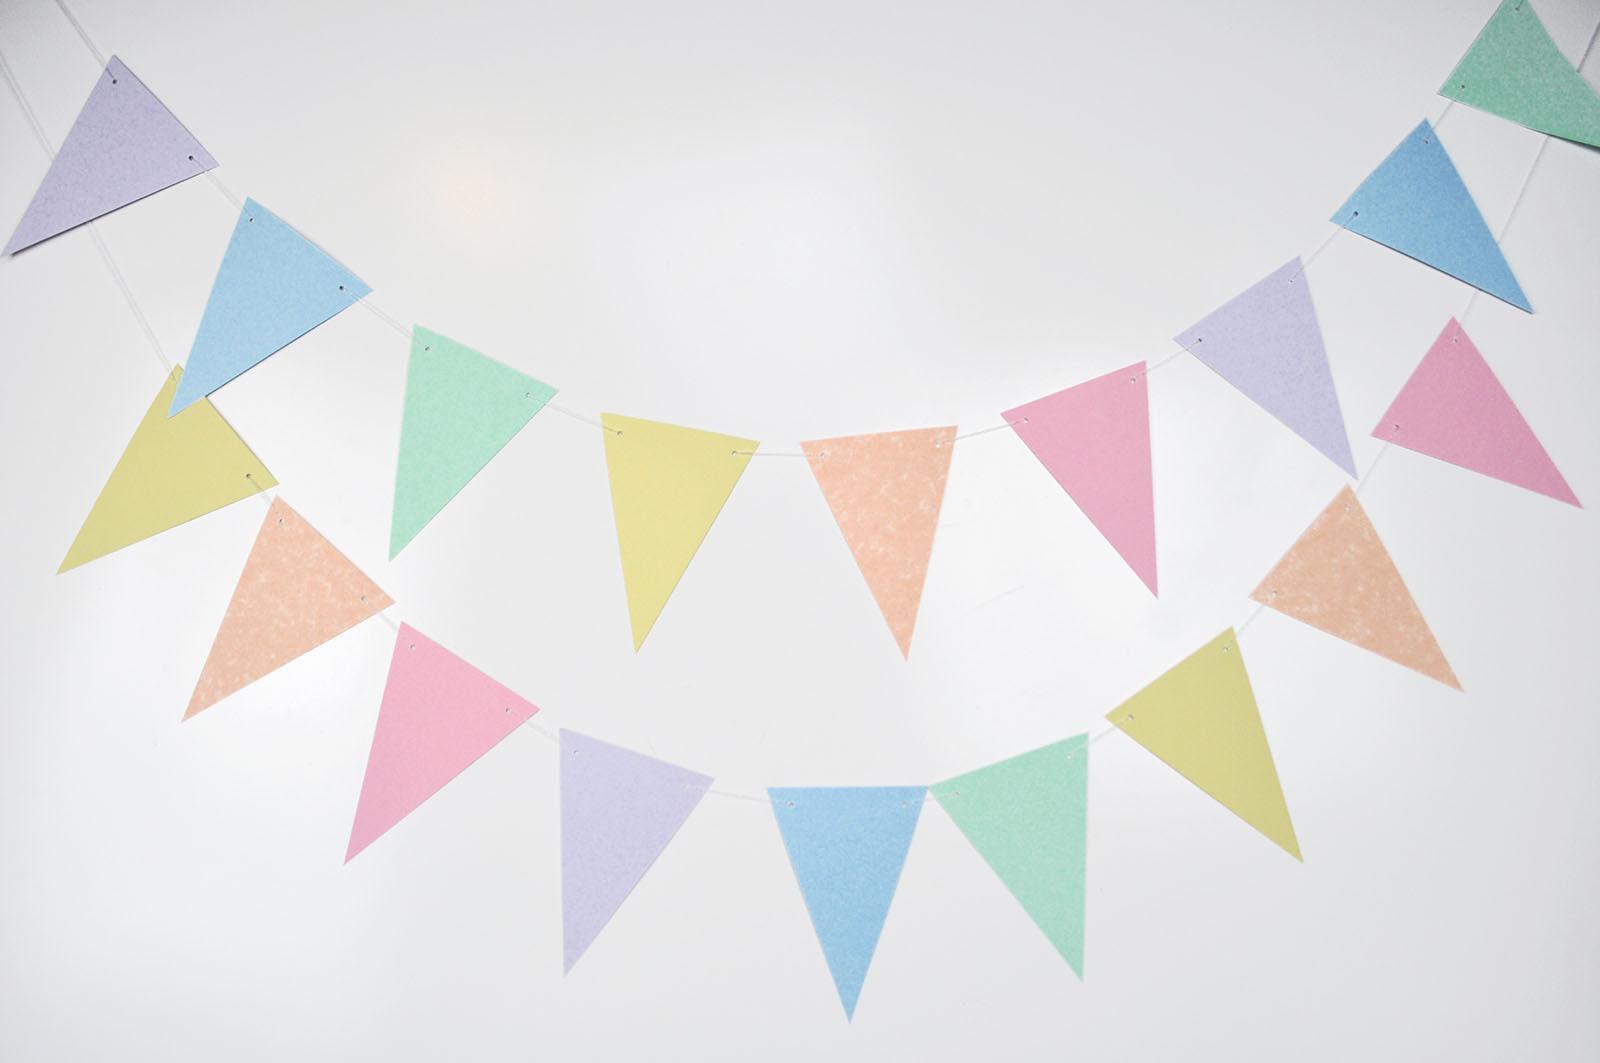 pastel rainbow flag bunting party shower wedding decoration | eBay